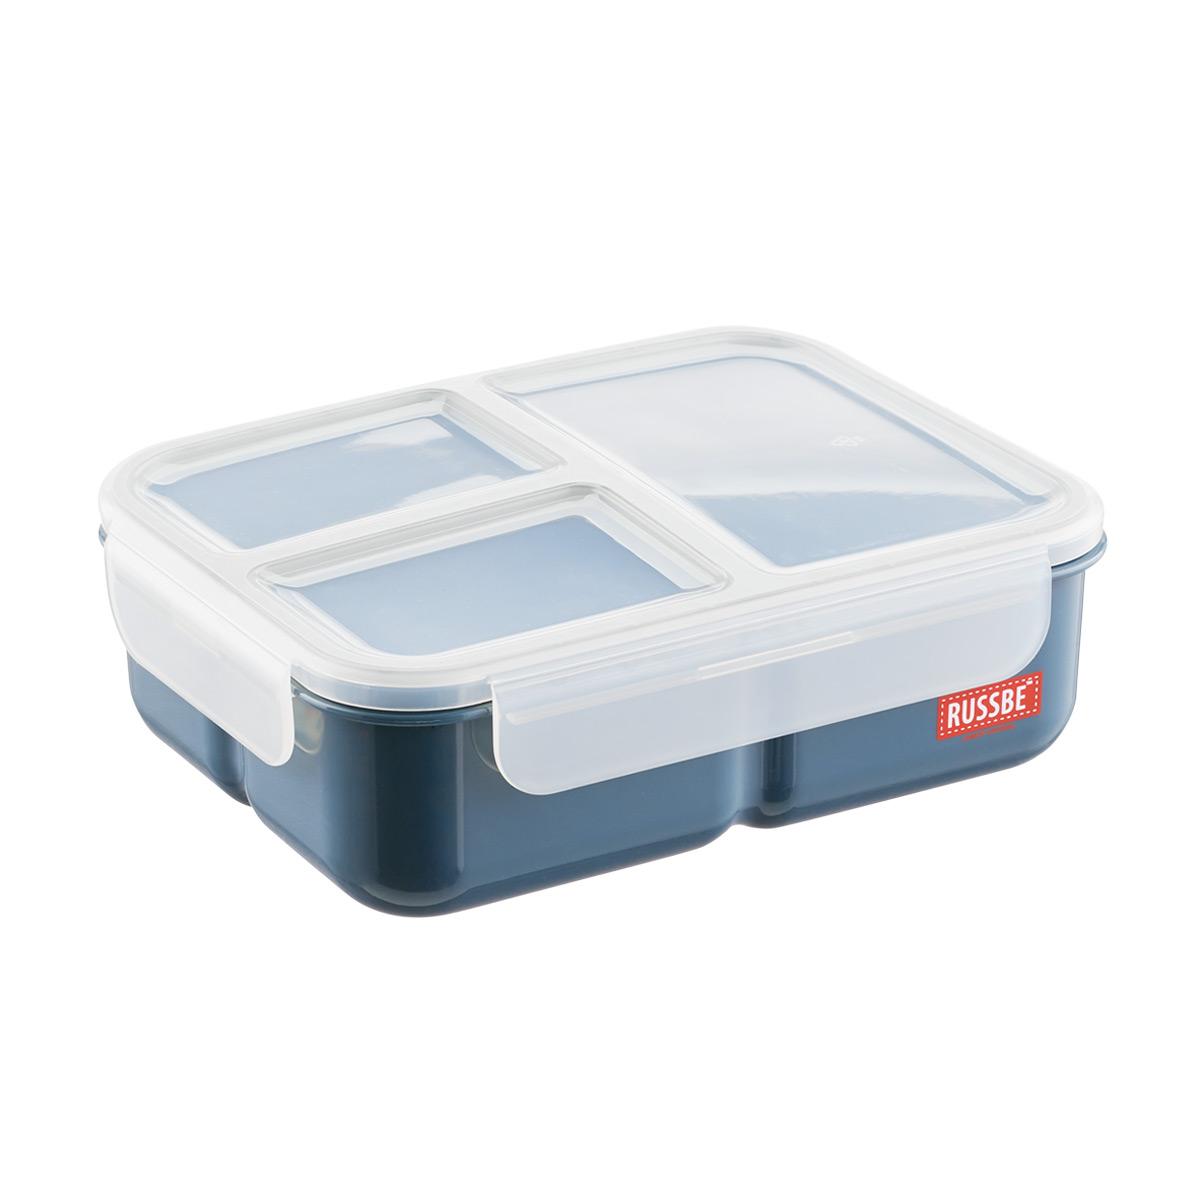 Russbe 53 oz. 3-Compartment Bento Box